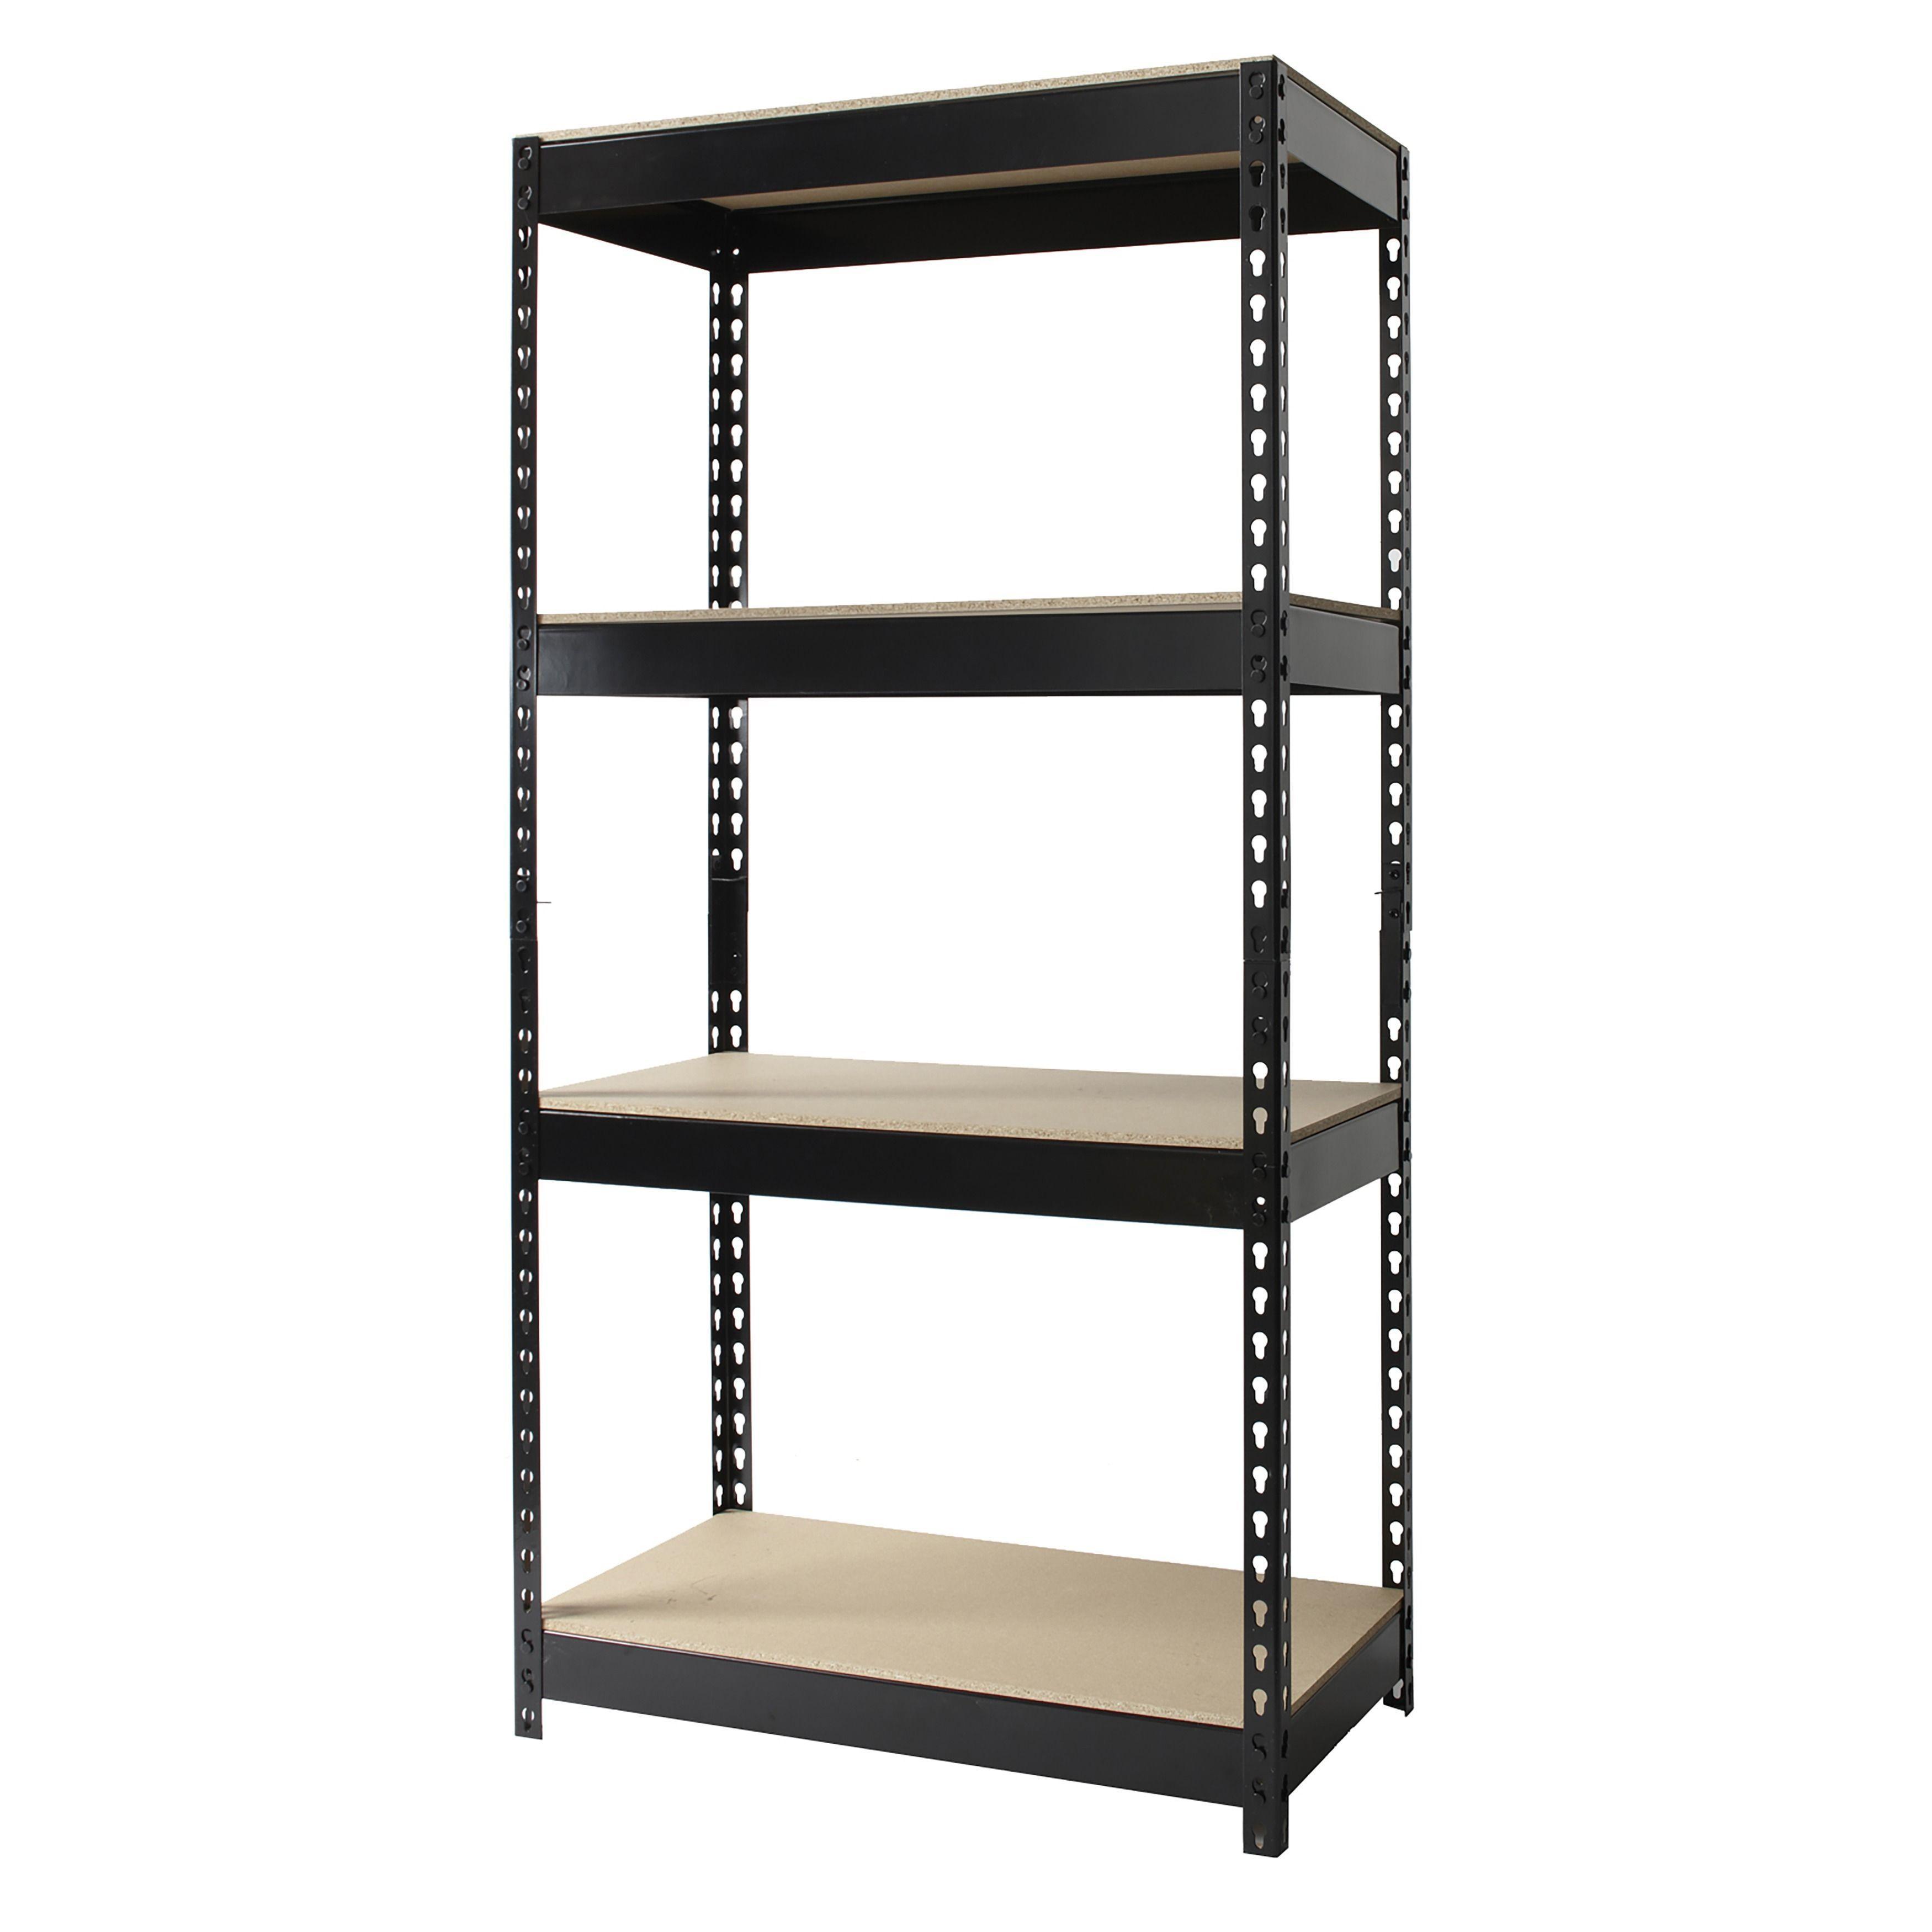 iron horse riveted steel 4 shelf shelving unit iron office